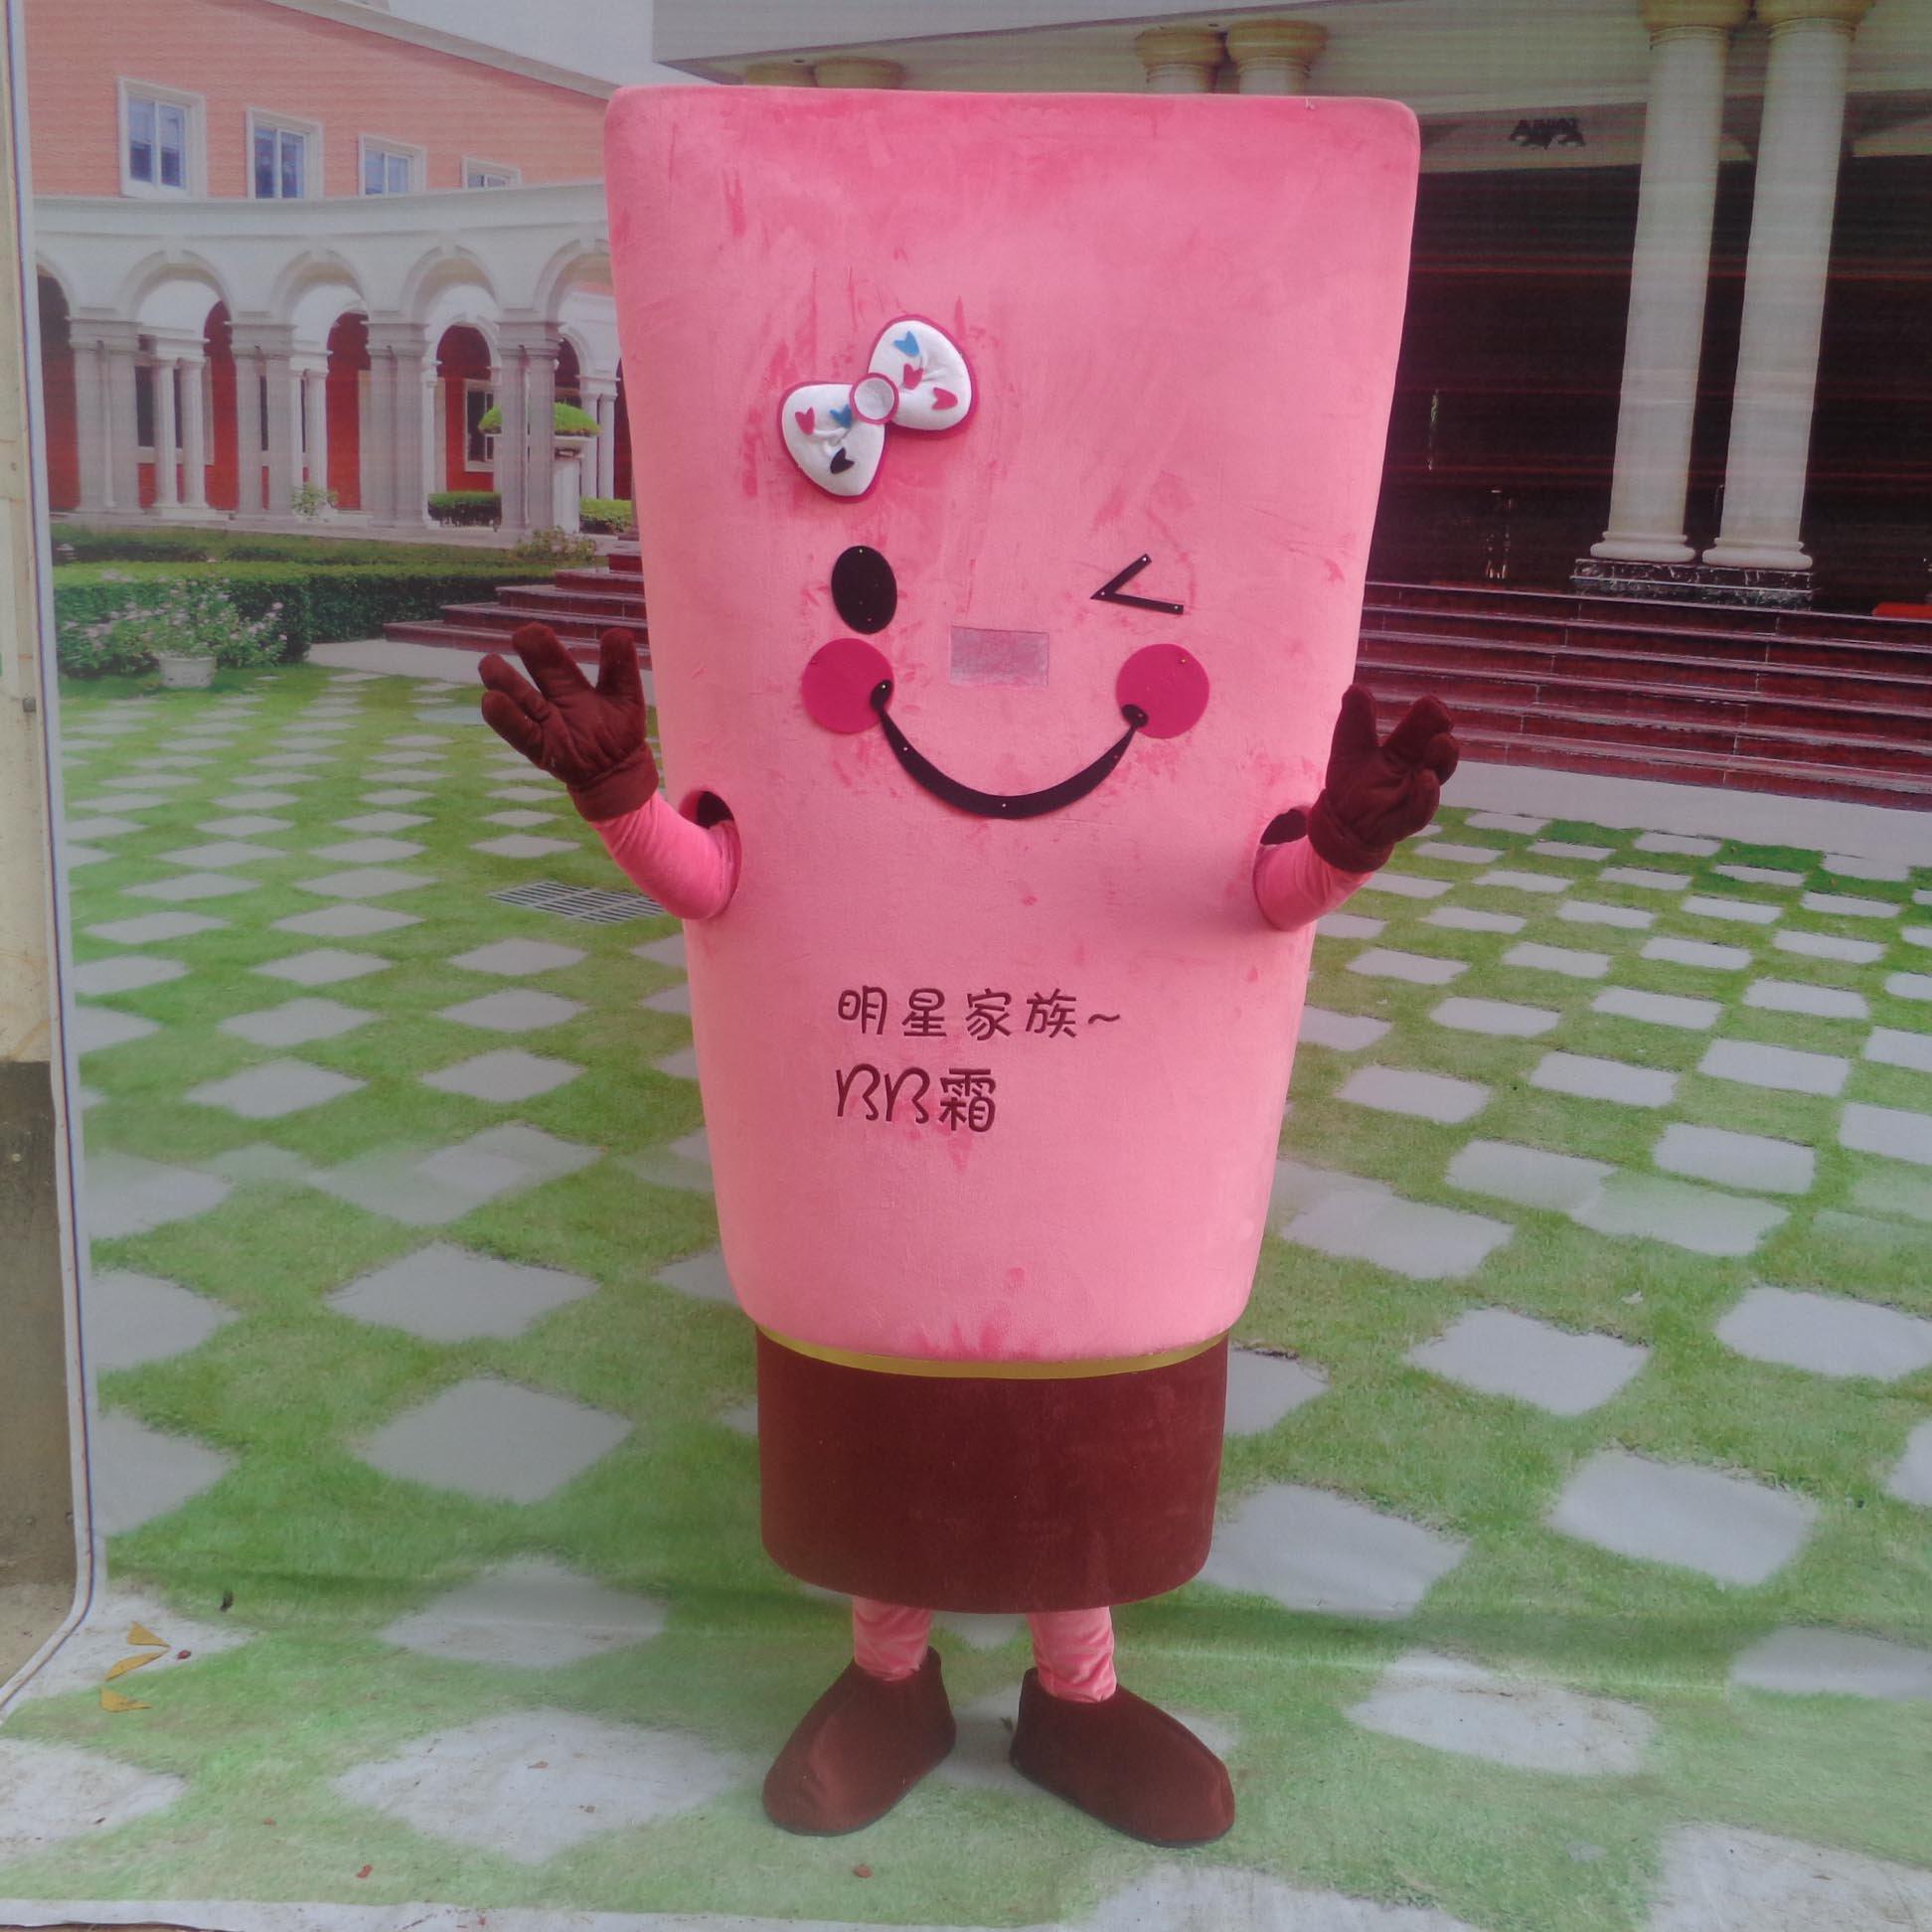 Cosmetics Cartoon Doll Clothing Cartoon Walking Doll Corporate Mascot Costumes Advertising